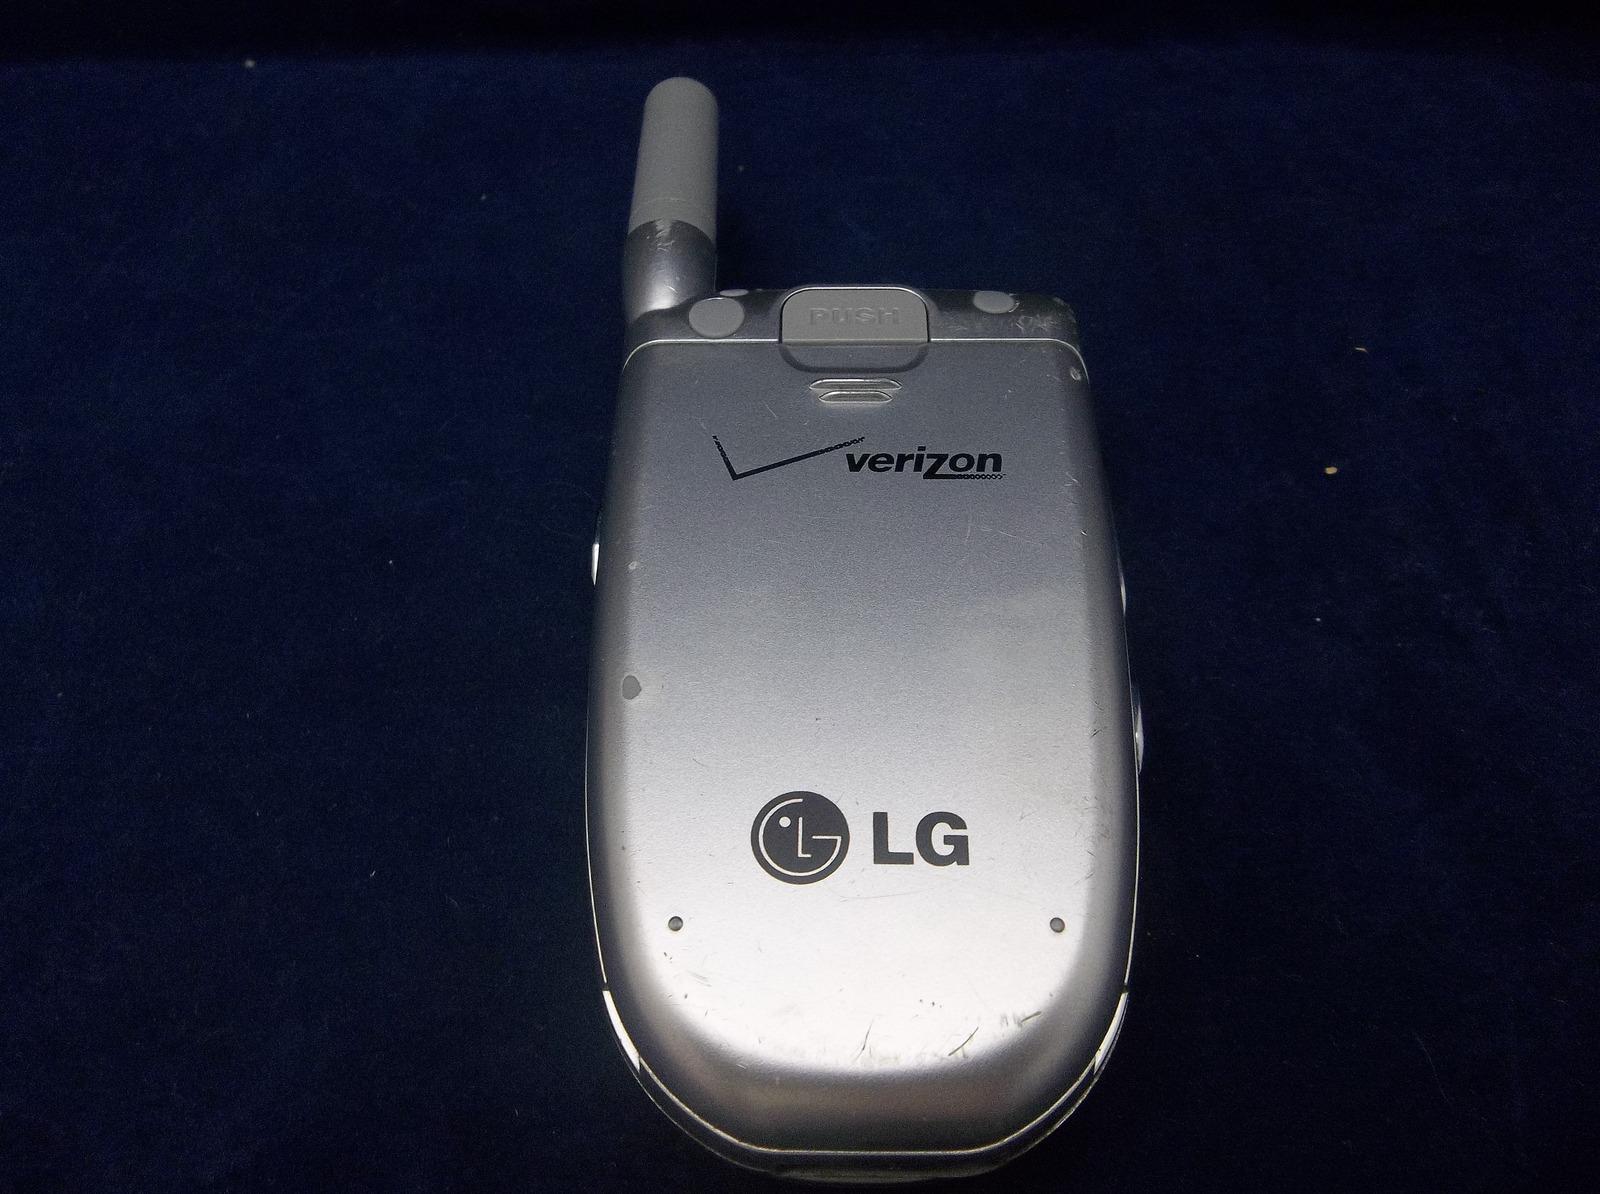 Similar to Verizon Wireless